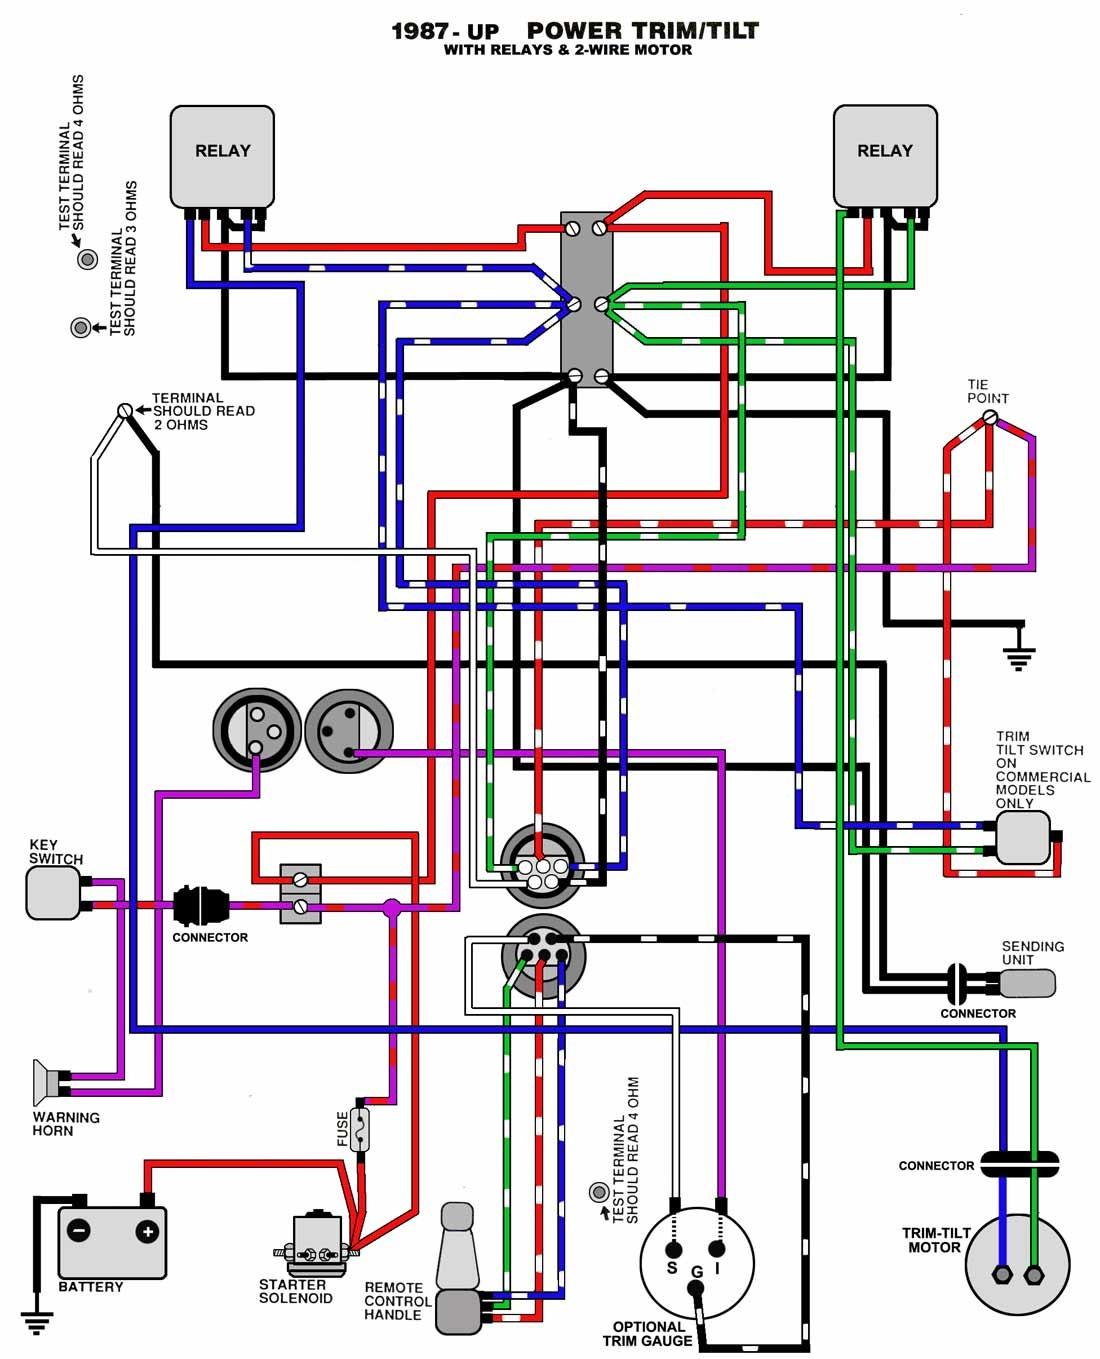 yamaha outboard wiring diagram collection wiring diagram rh visithoustontexas org yamaha 115 hp outboard wiring diagram